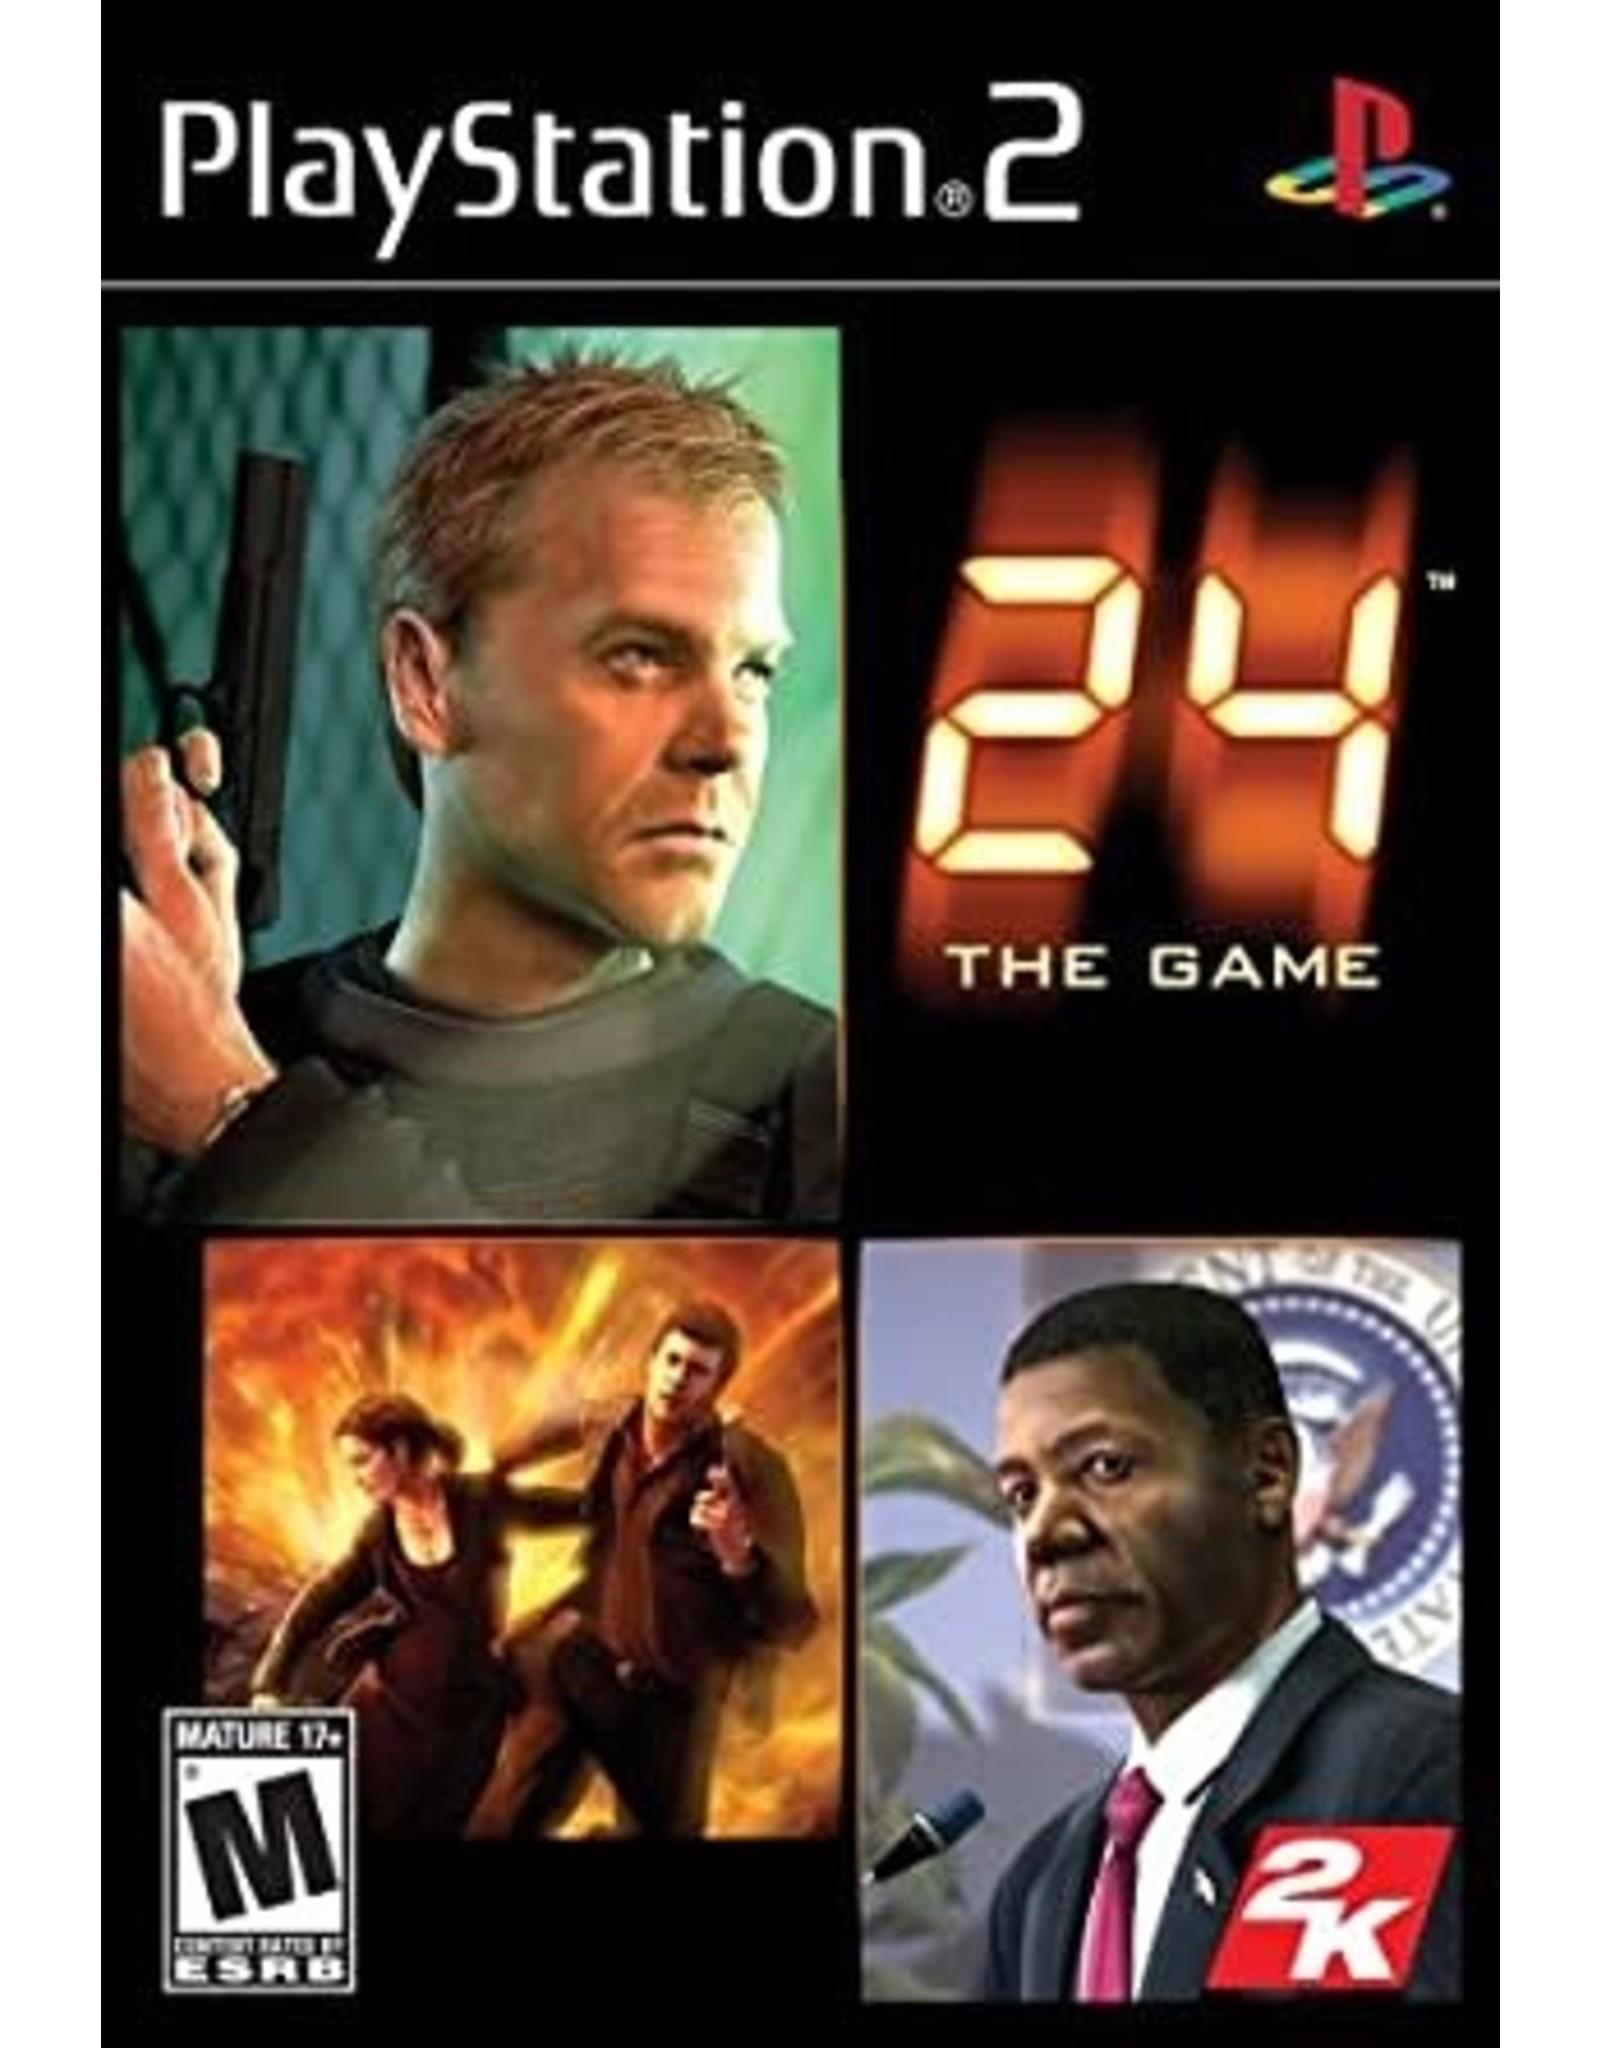 Playstation 2 24 the Game (CIB)